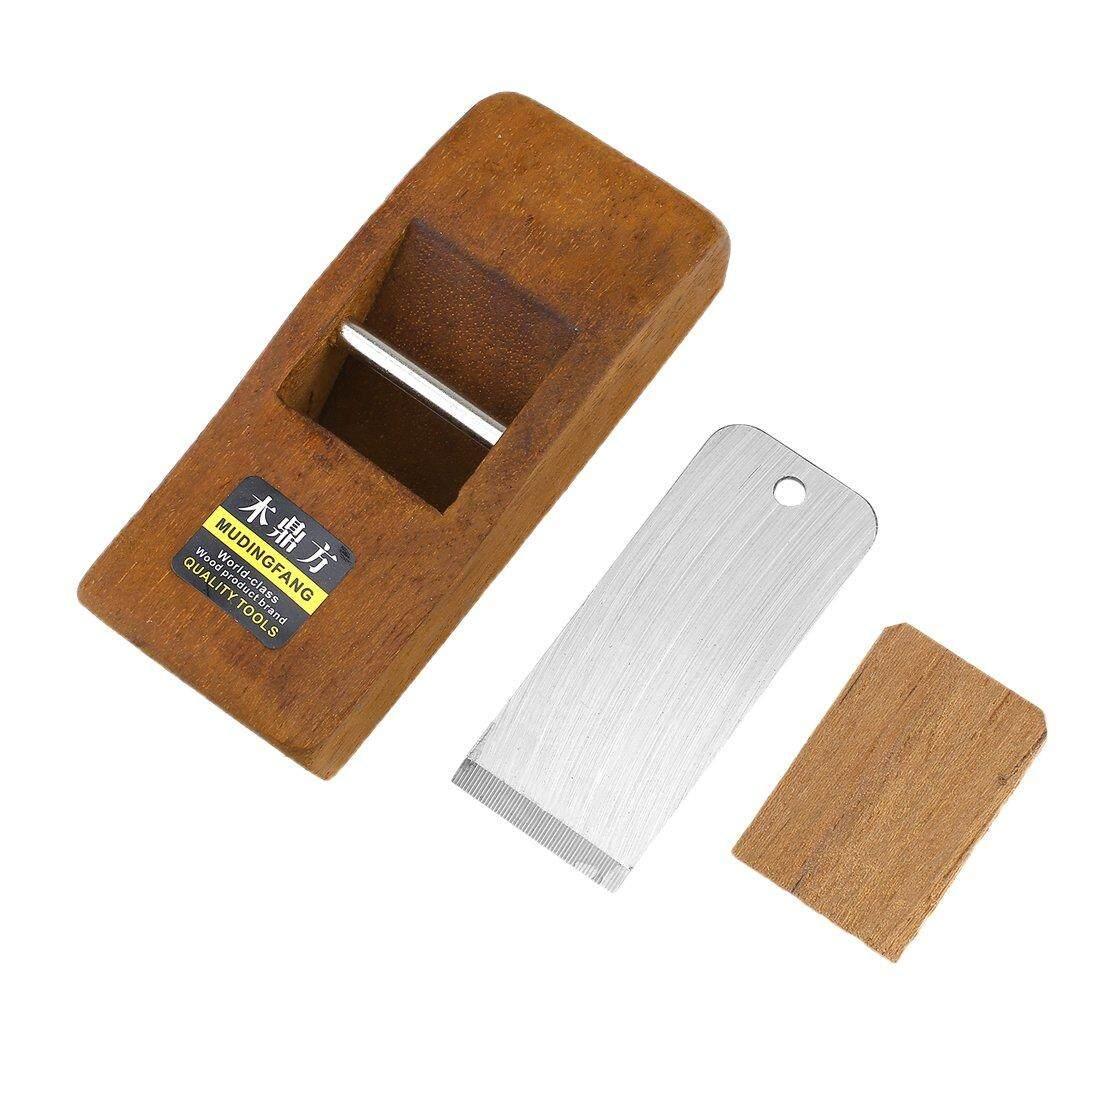 Best Sale Music 108MM Mini Woodworking Flat Plane Hand Planer DIY Tool Carpenter Woodcraft